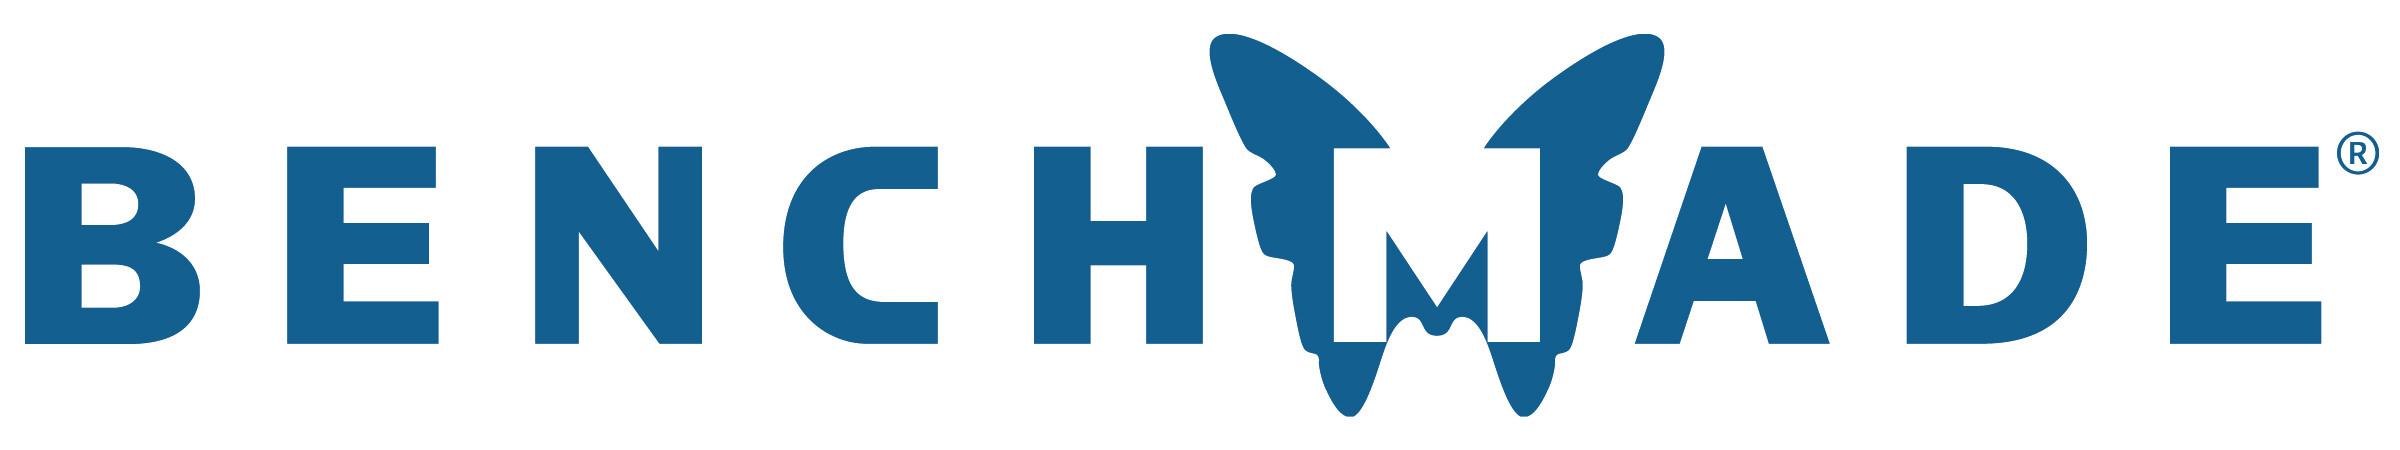 Benchmade Logo Blue Pms 300 Fog Horn